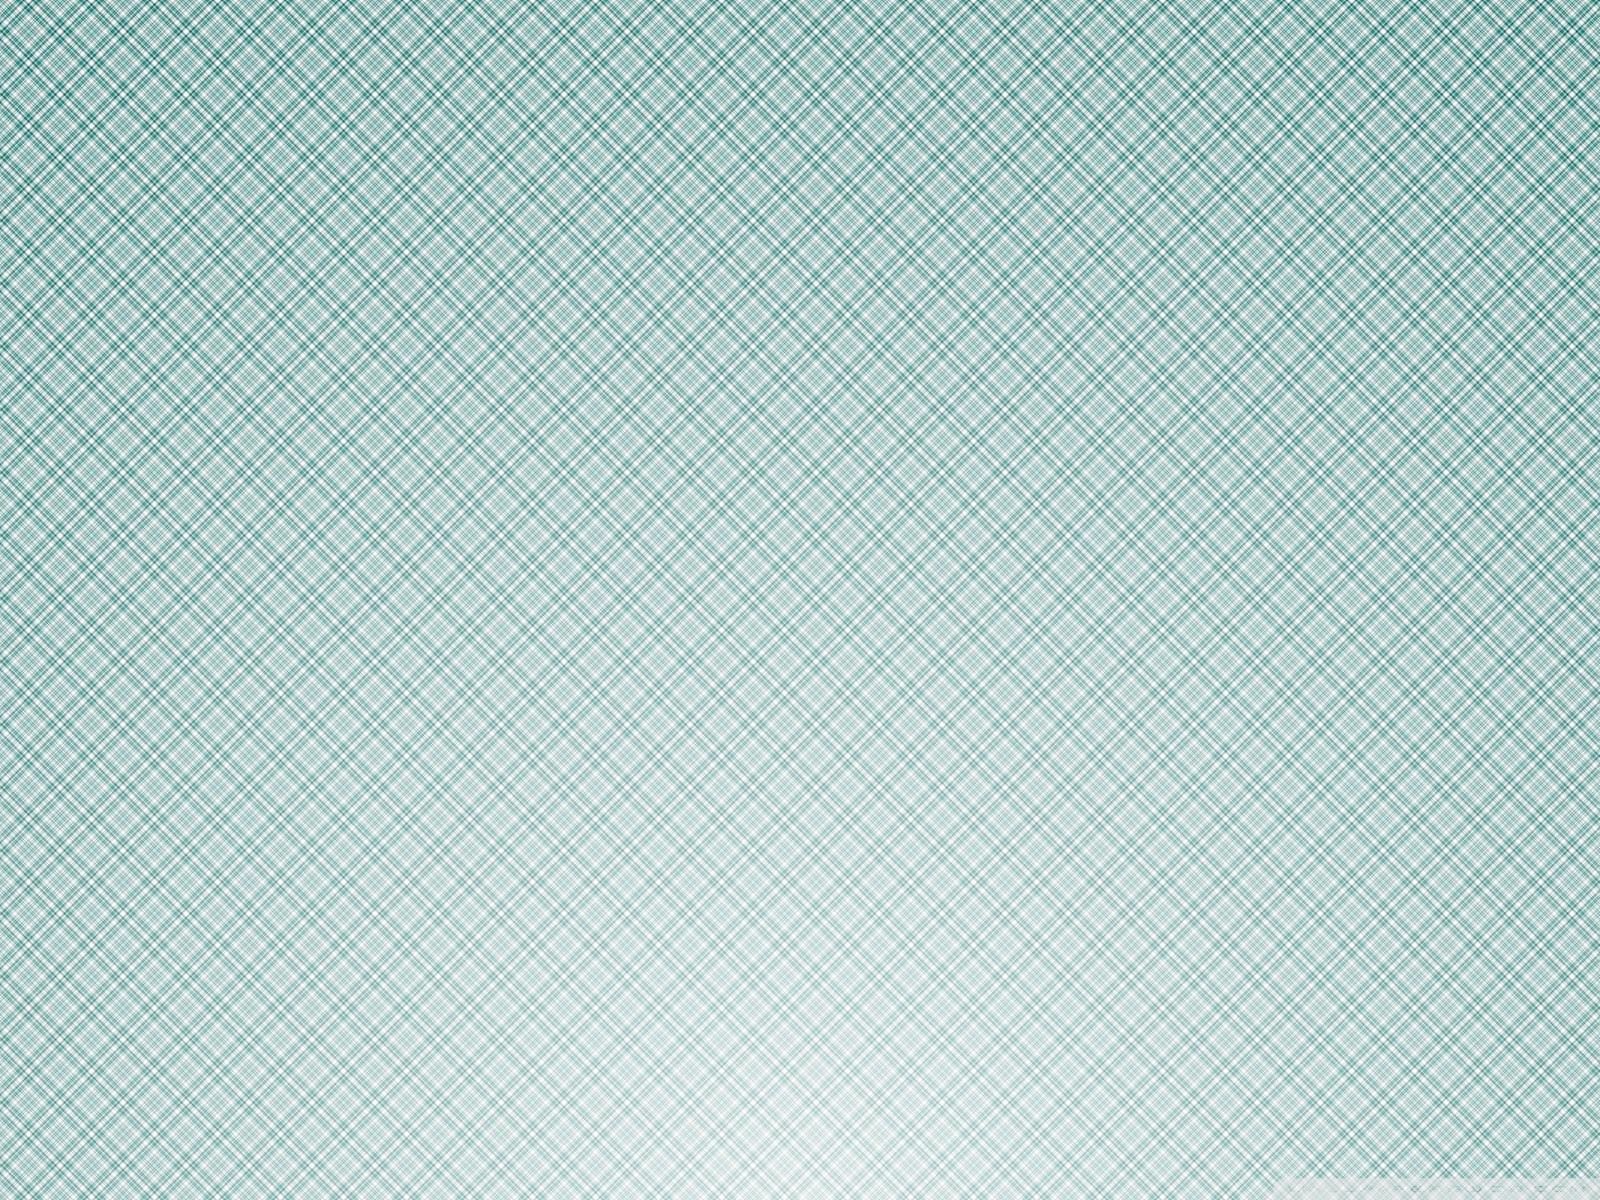 Scottish Texture Hd Desktop Wallpaper High Definition